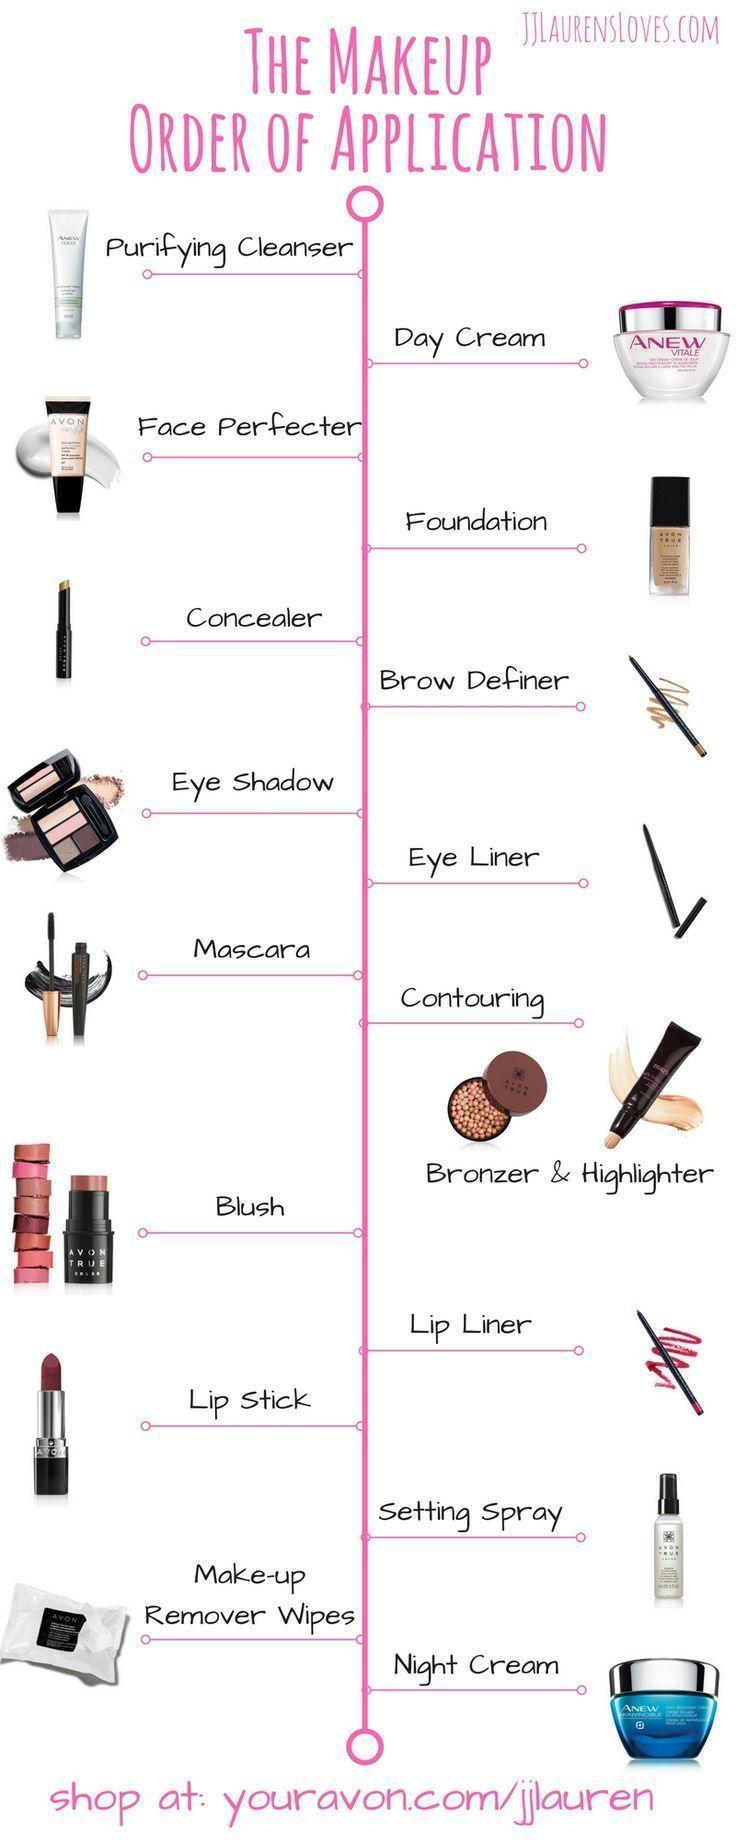 Application Makeup Order